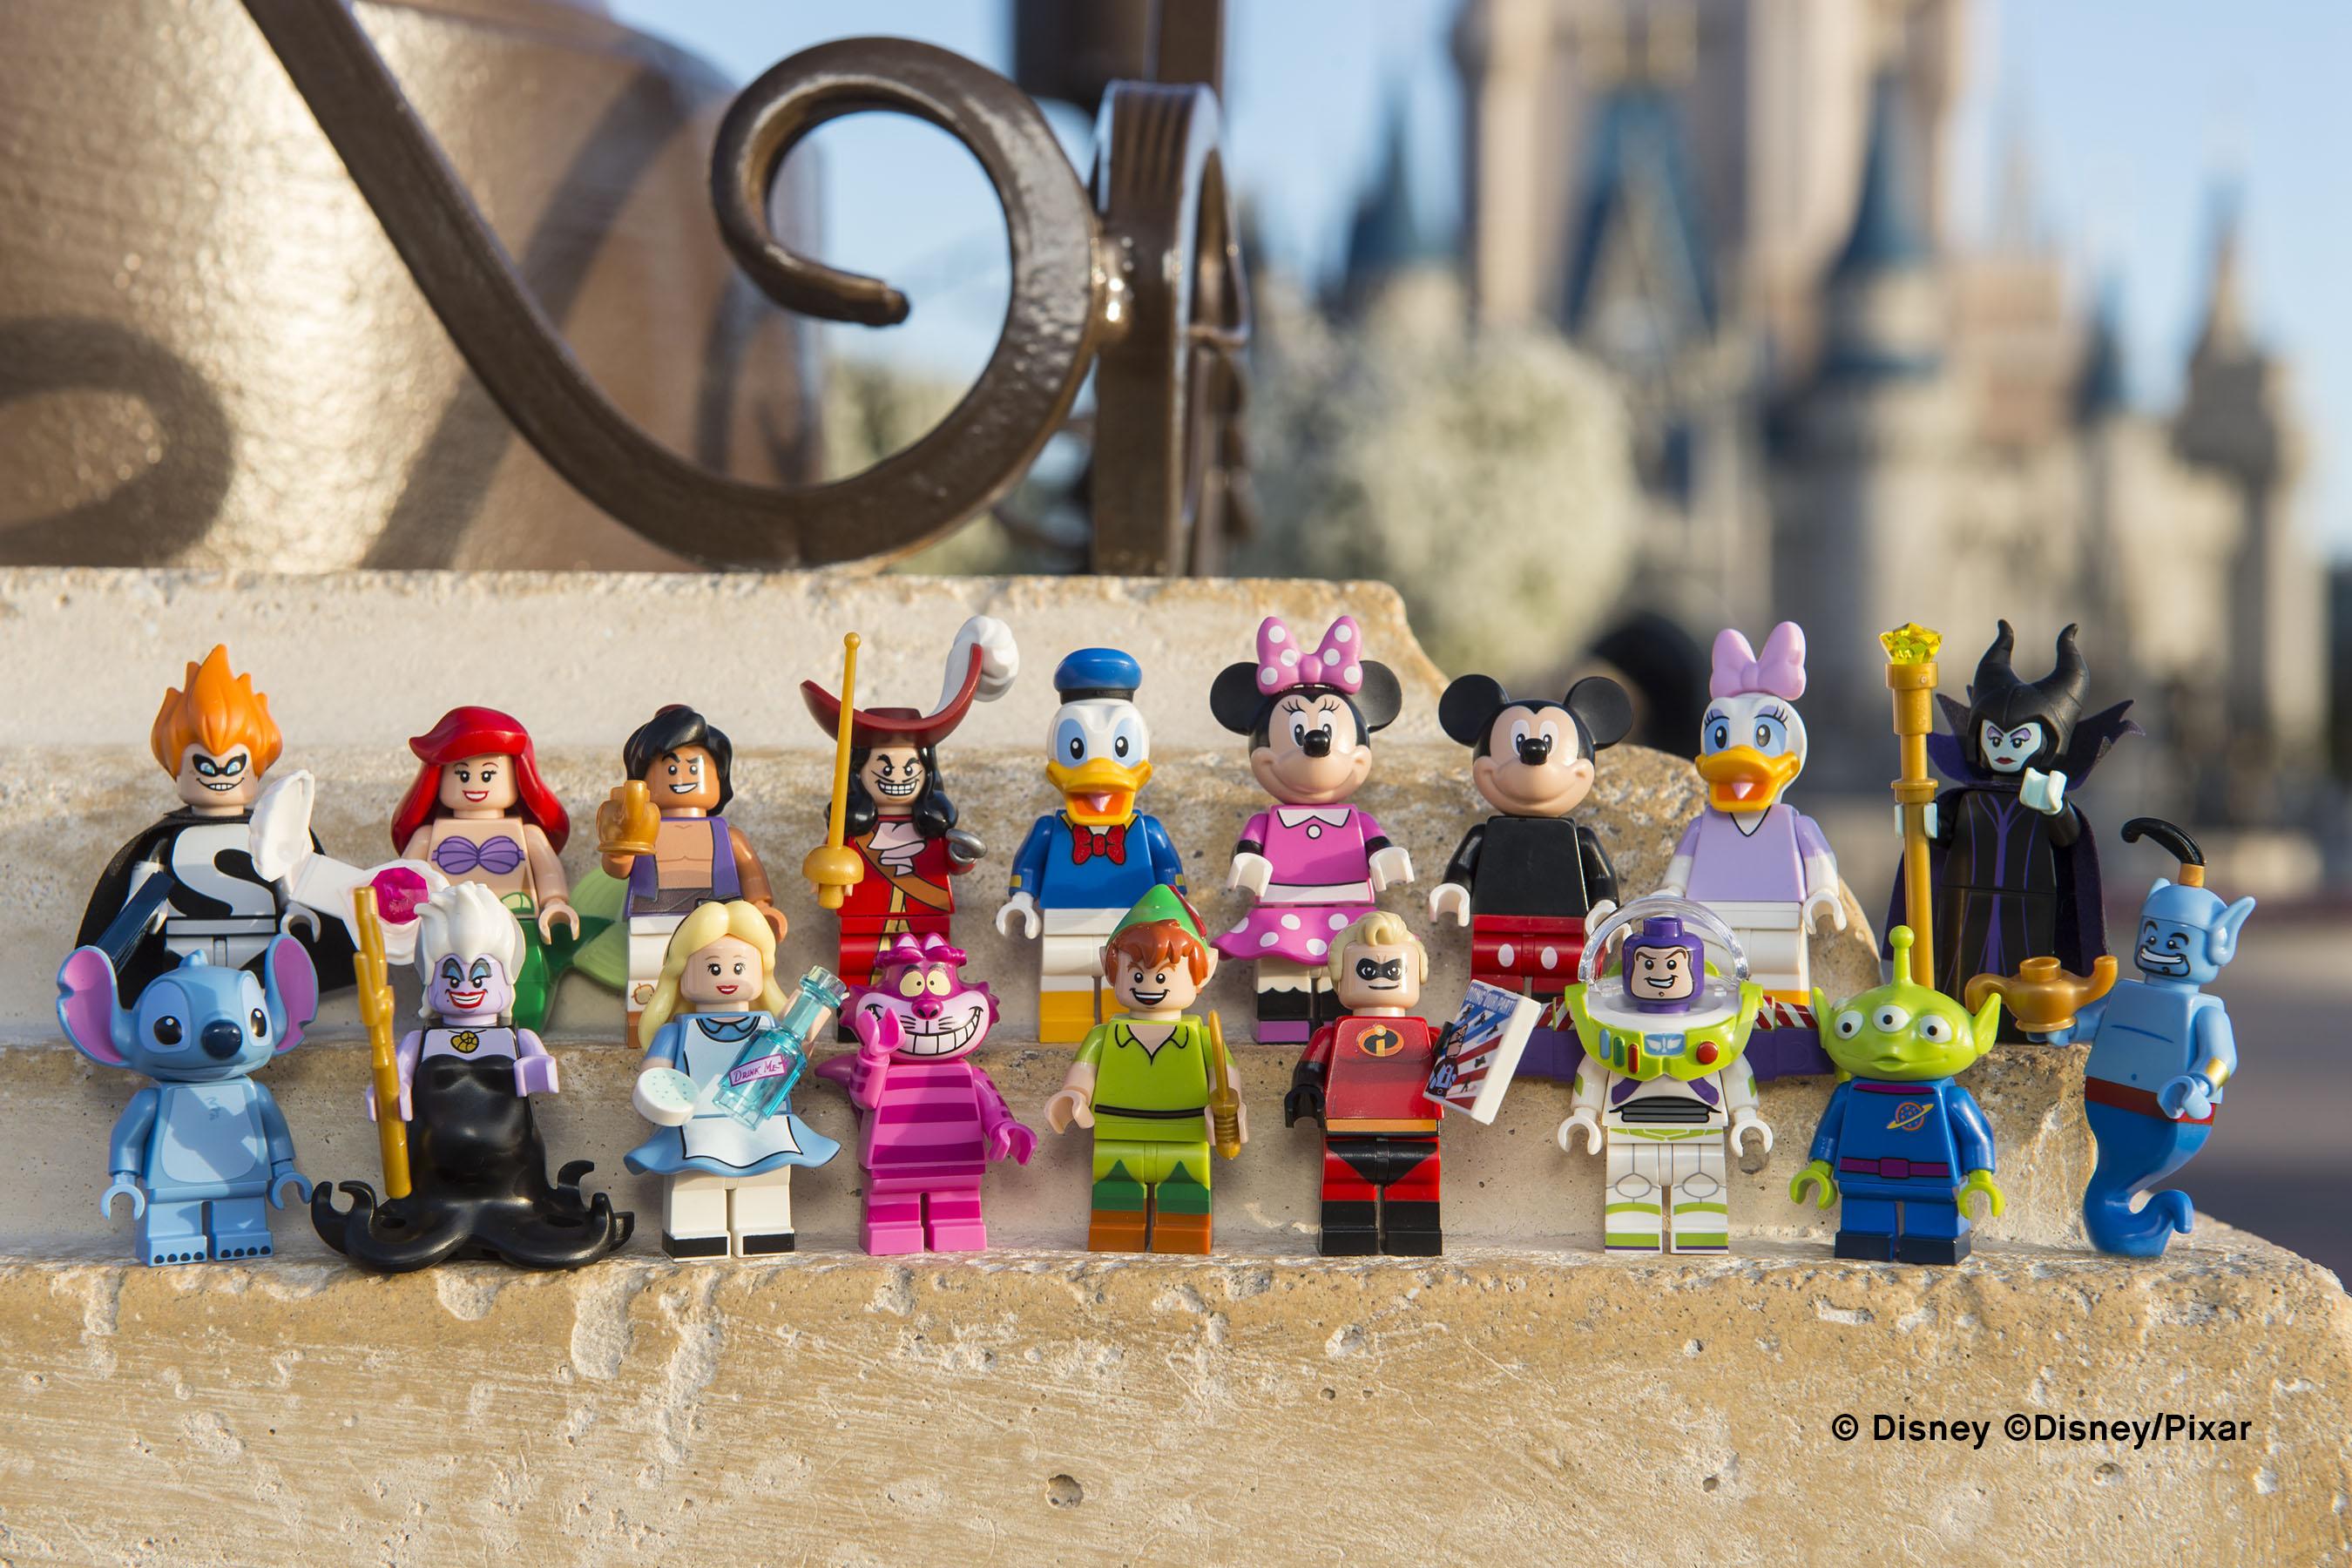 Sono arrivate le Minifigure Lego Disney!